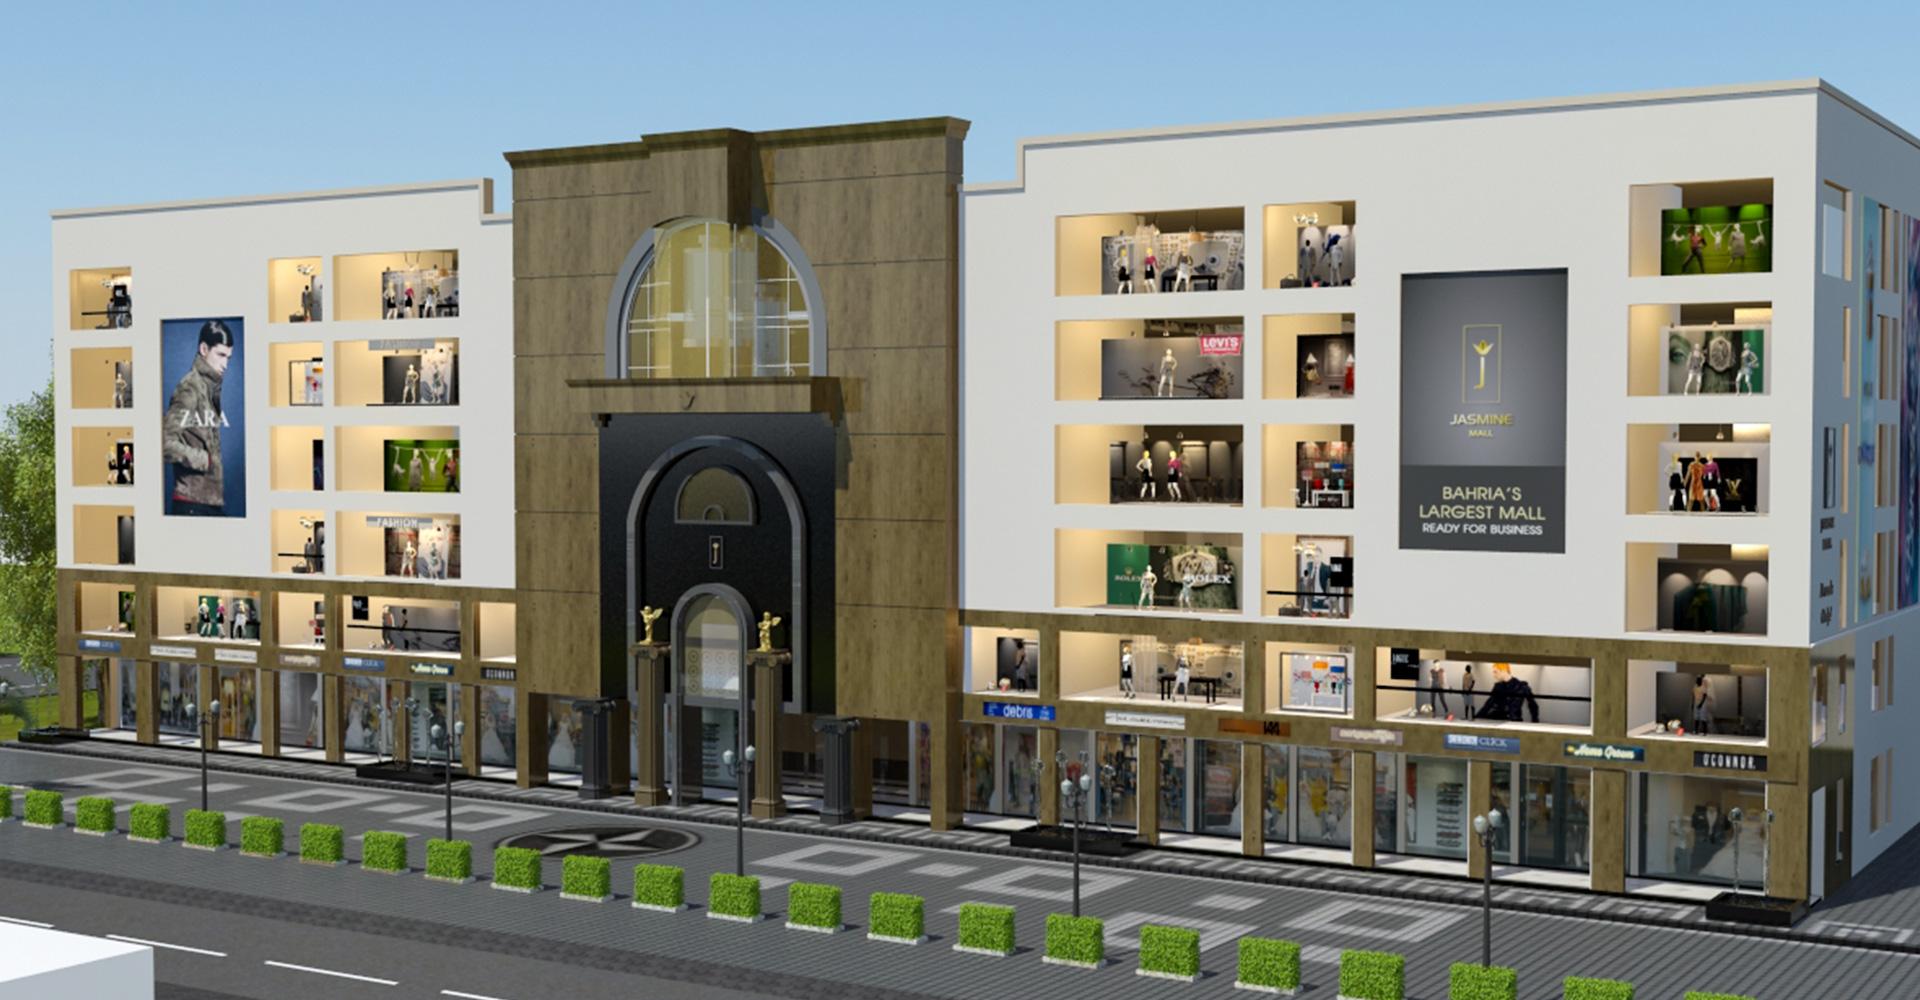 Building-Design-Hiline-Lahore-portfolio-Jasmine-Mall-Bahria-Town-07